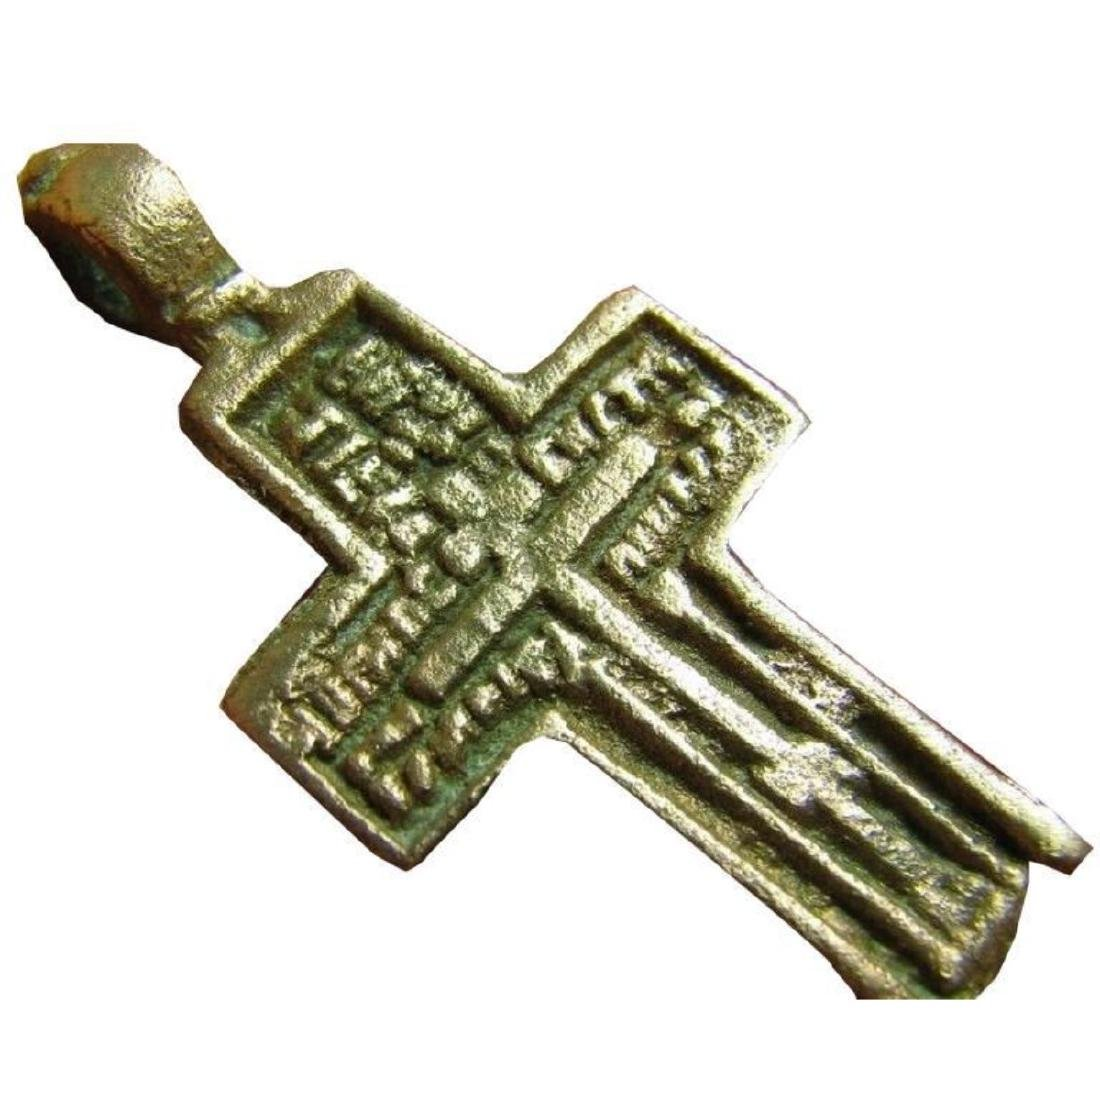 Prayer Big Relief Late Medieval Church Bronze Cross